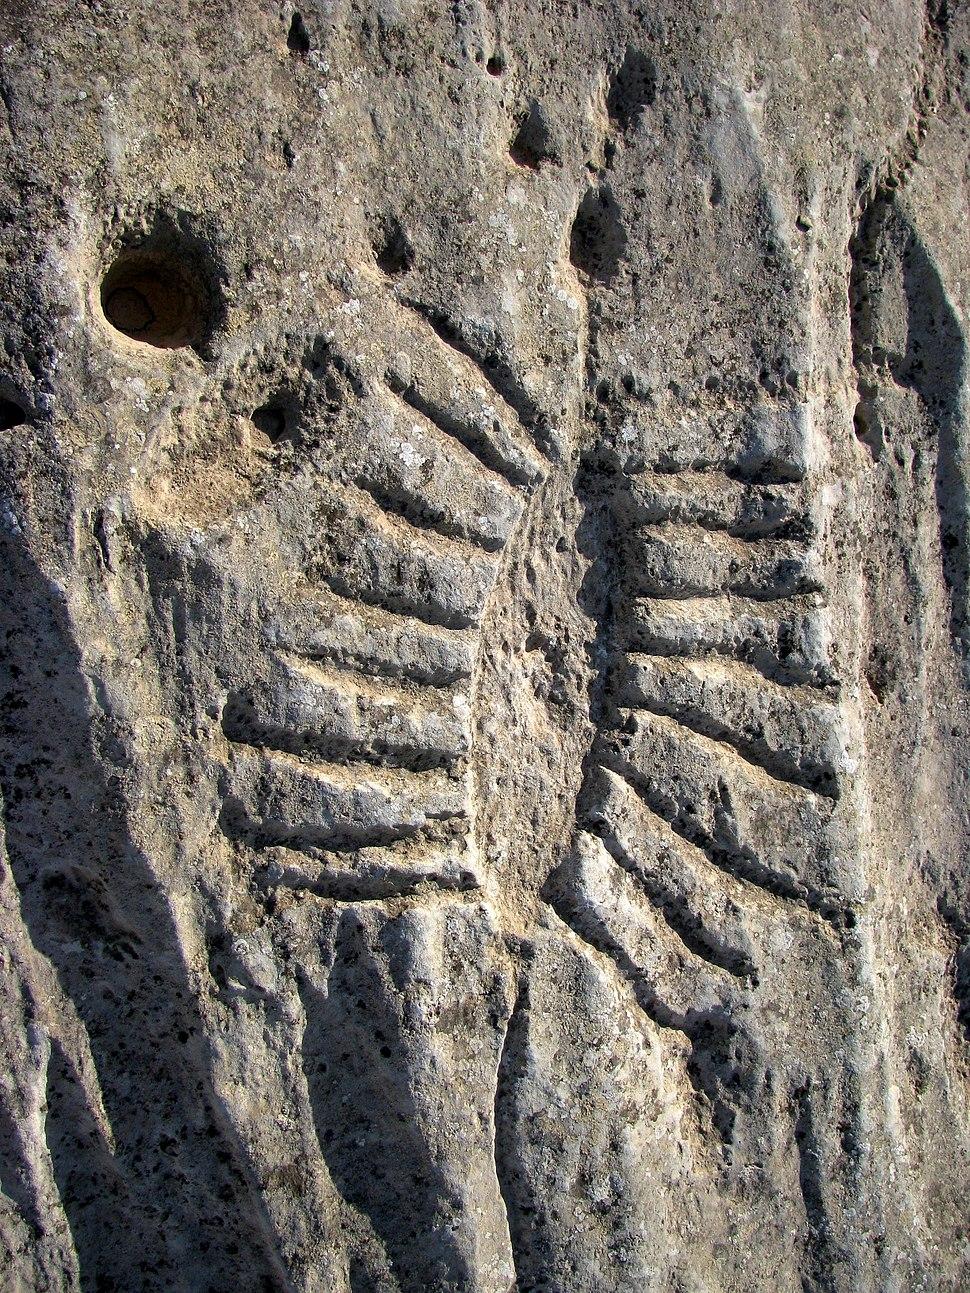 Jebel Jassassiyeh rock carvings